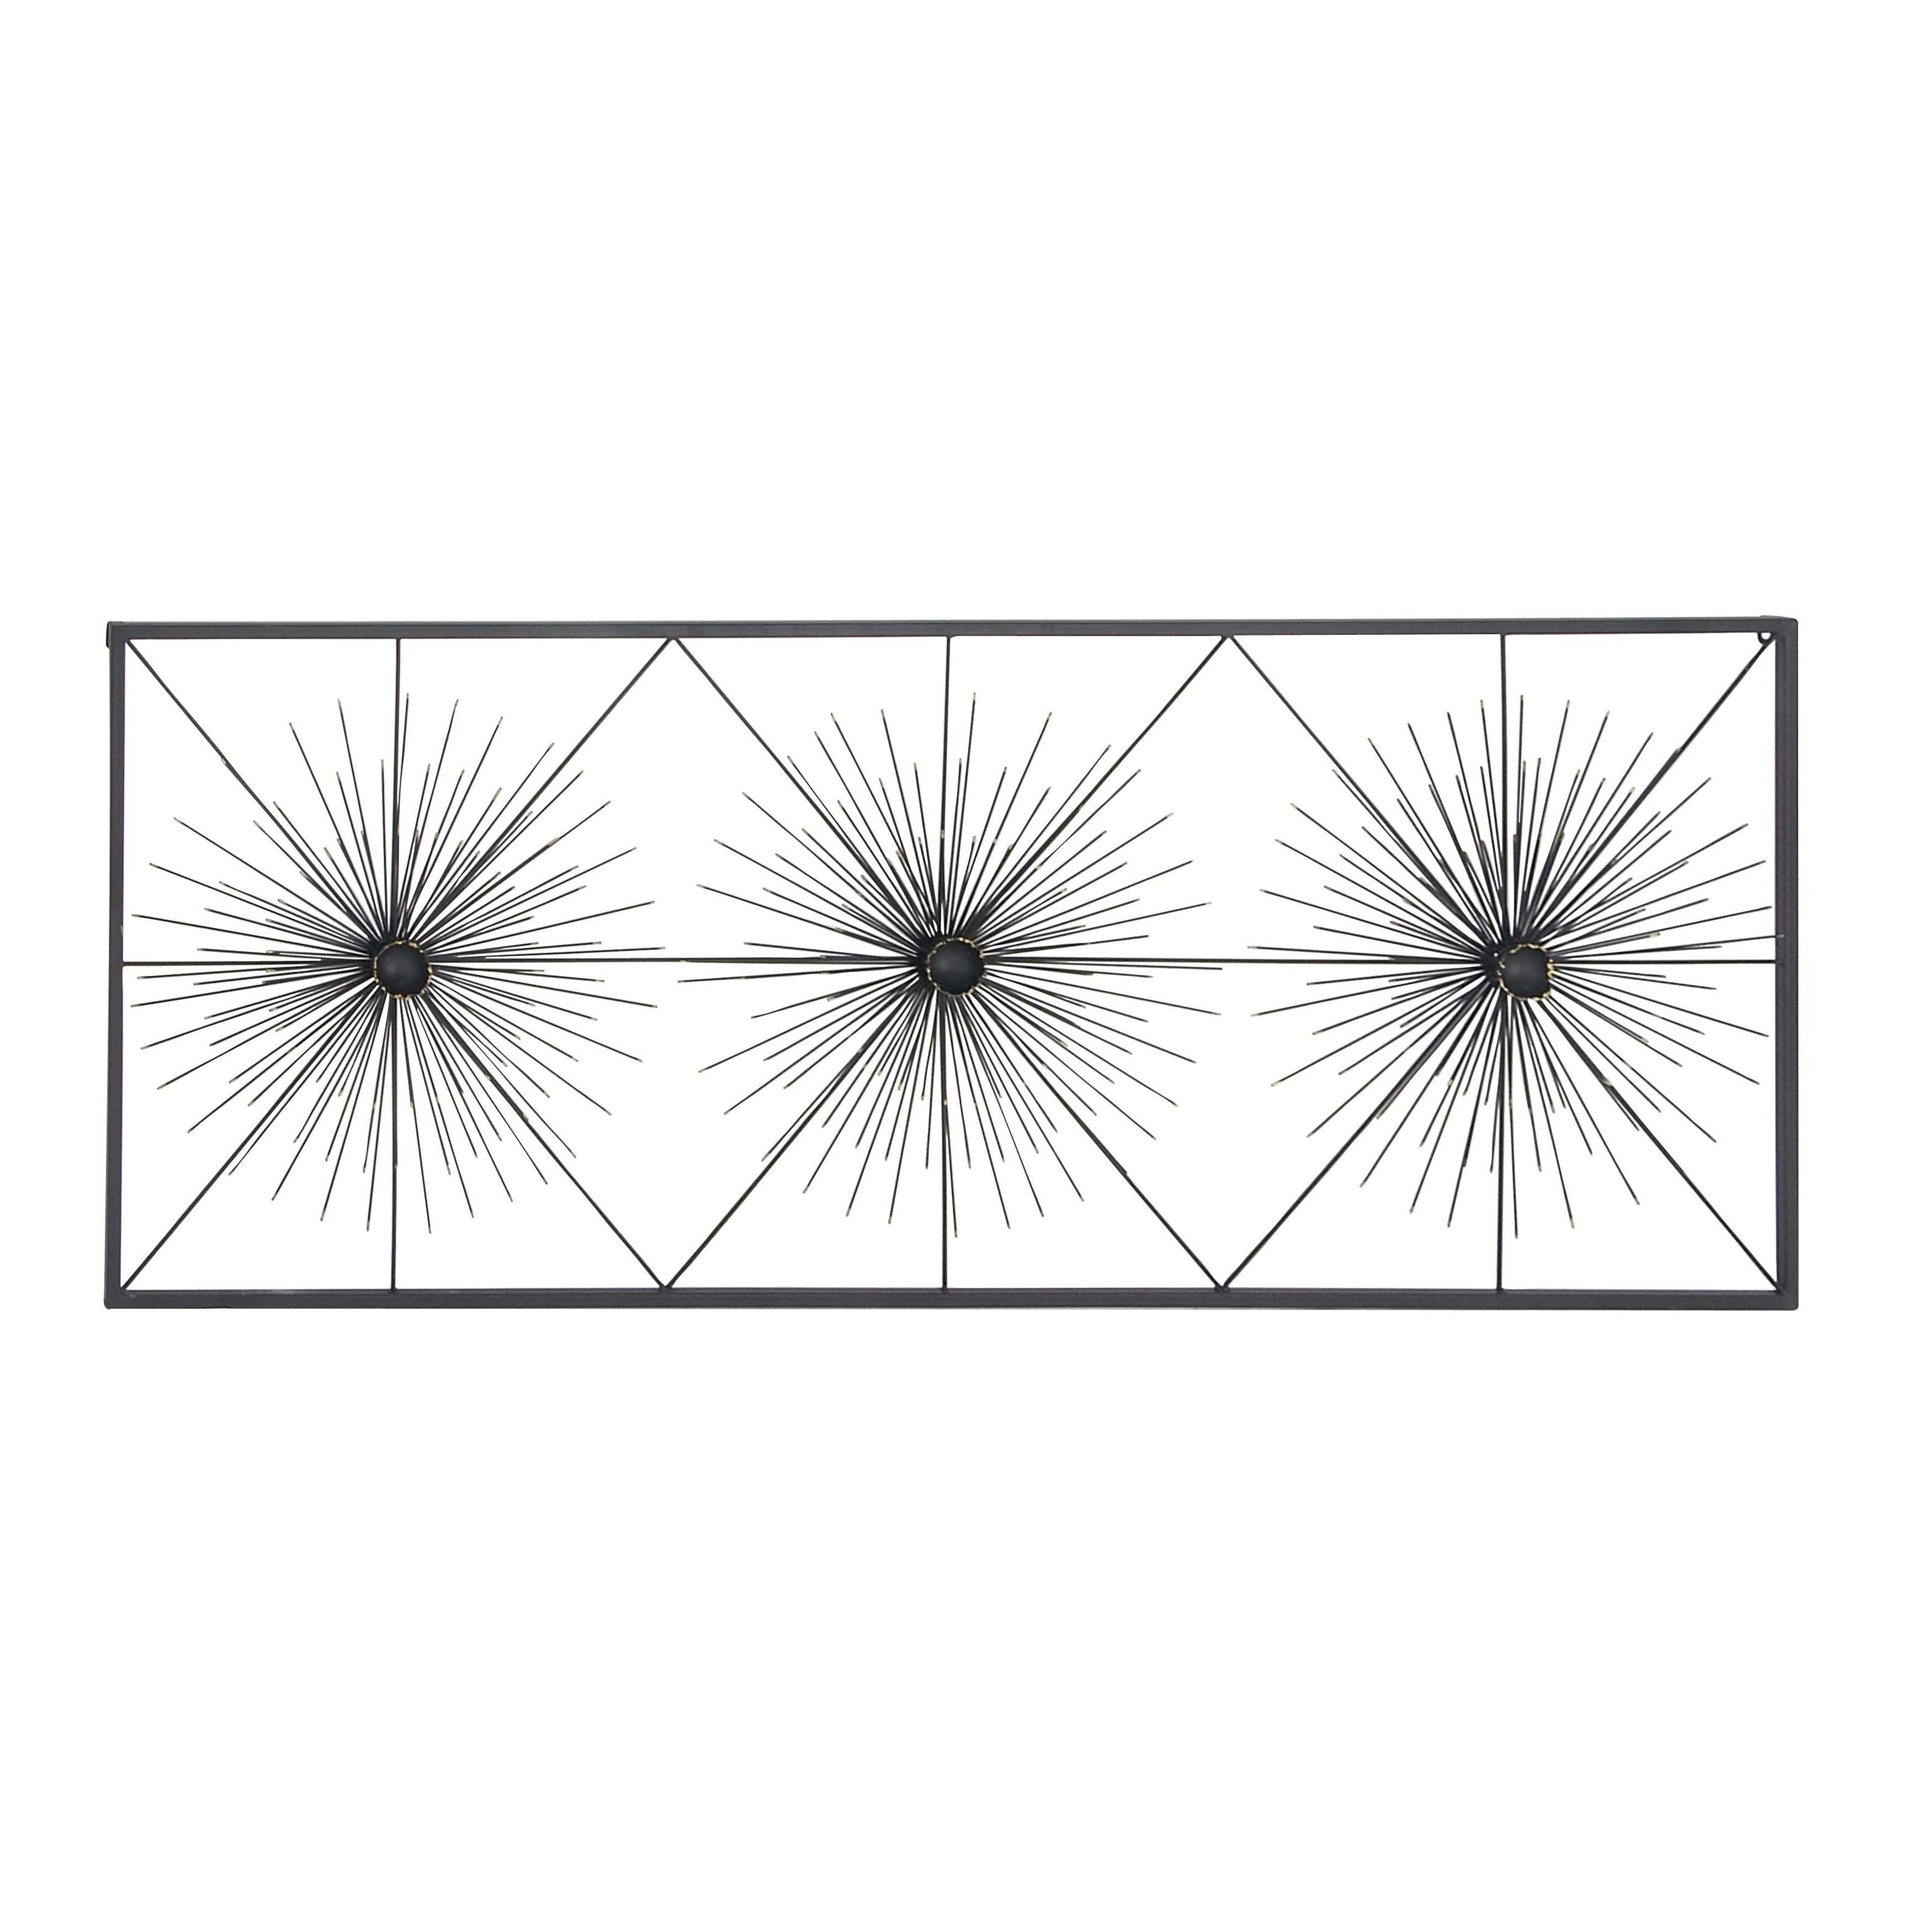 Contemporary Iron Geometric Burst Wall Decor With Contemporary Geometric Wall Decor (View 9 of 30)